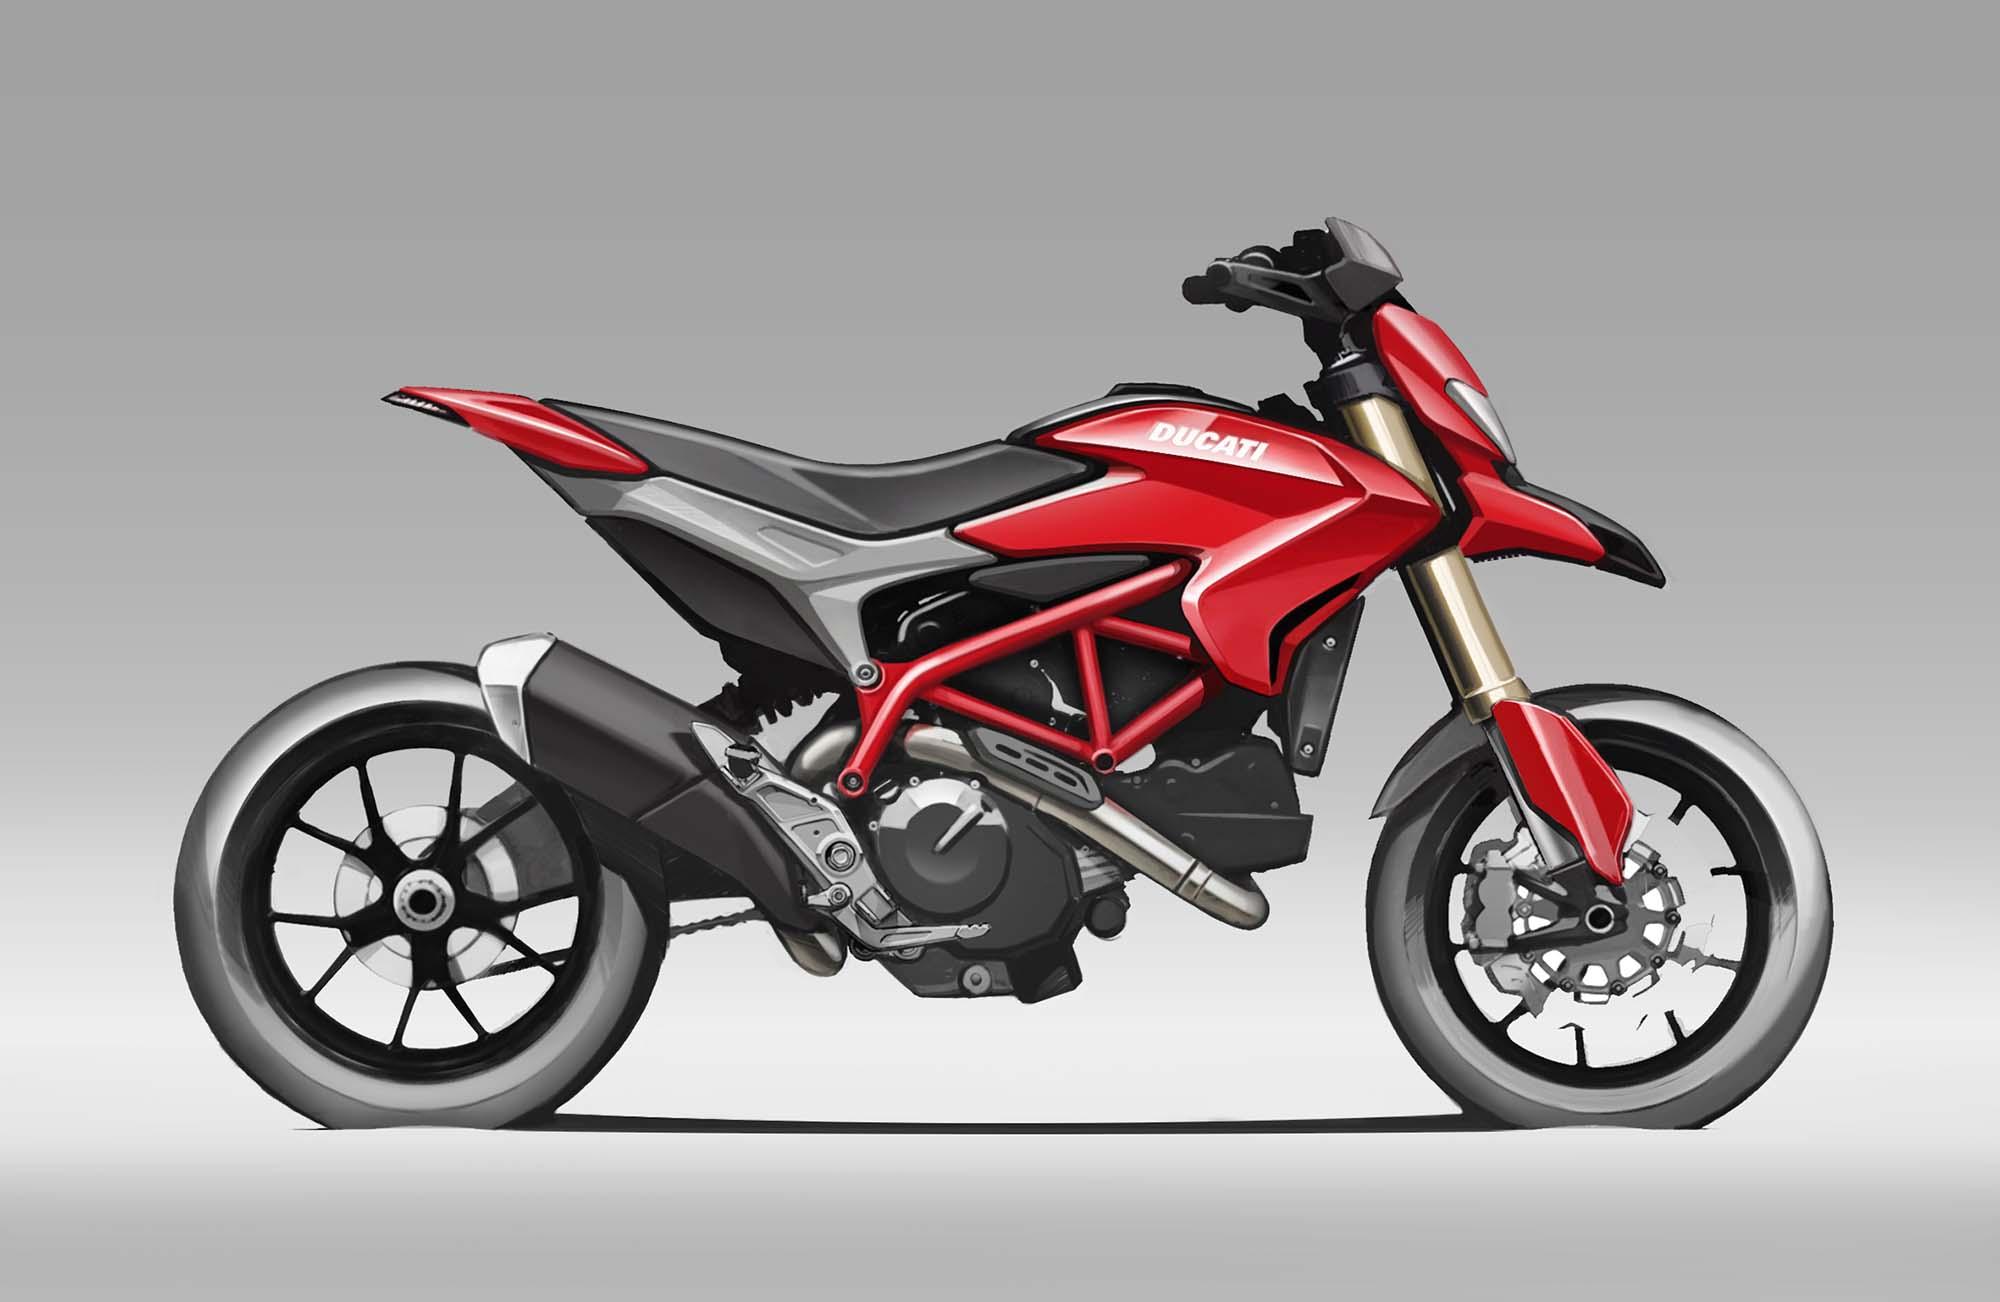 2013 Ducati Hypermotard Mega Gallery 2013 Ducati Hypermotard design 09 ...